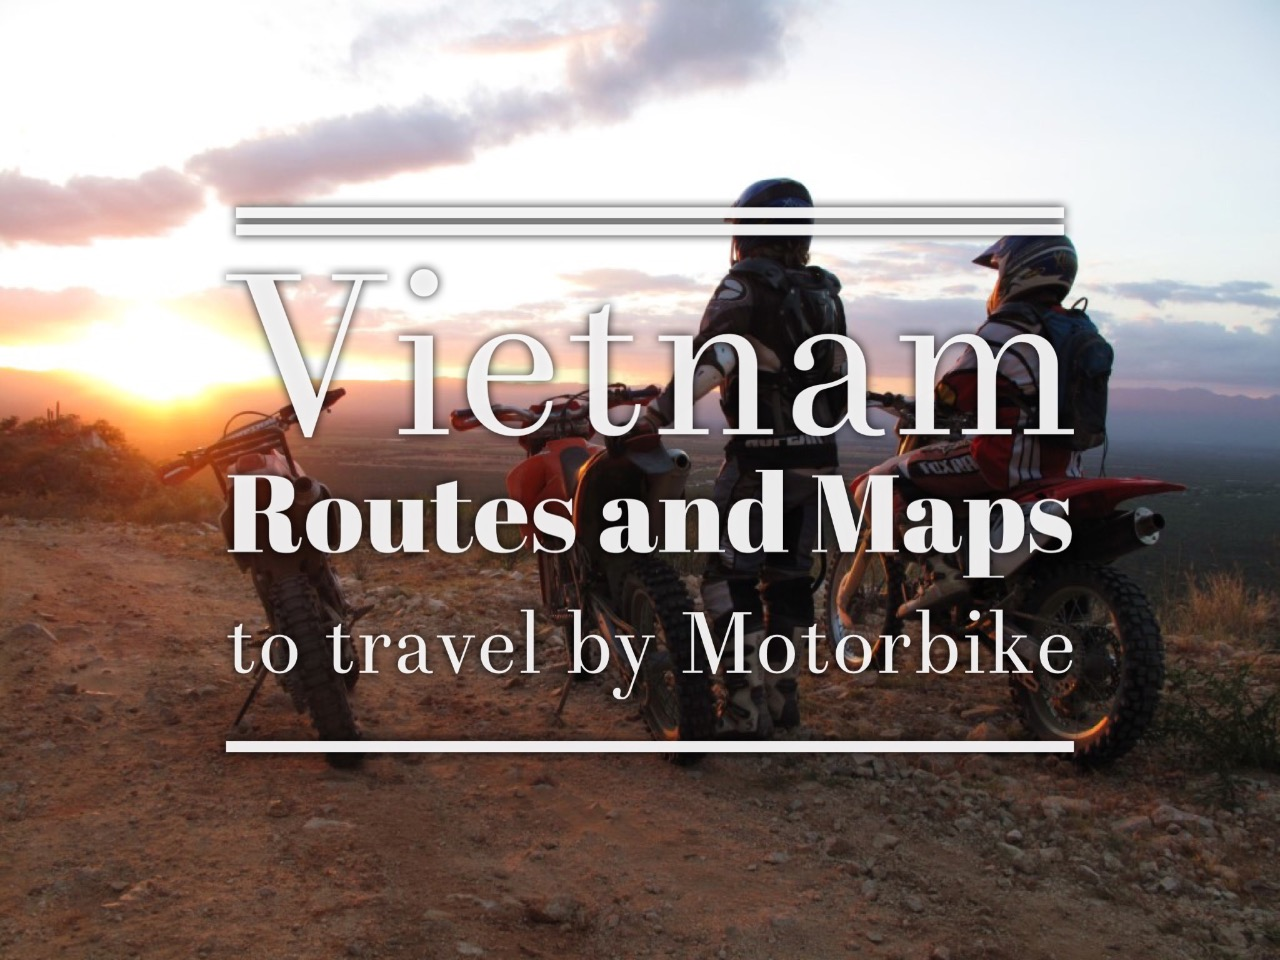 Vietnam routes and maps by motorbike - TigitMotorbikes